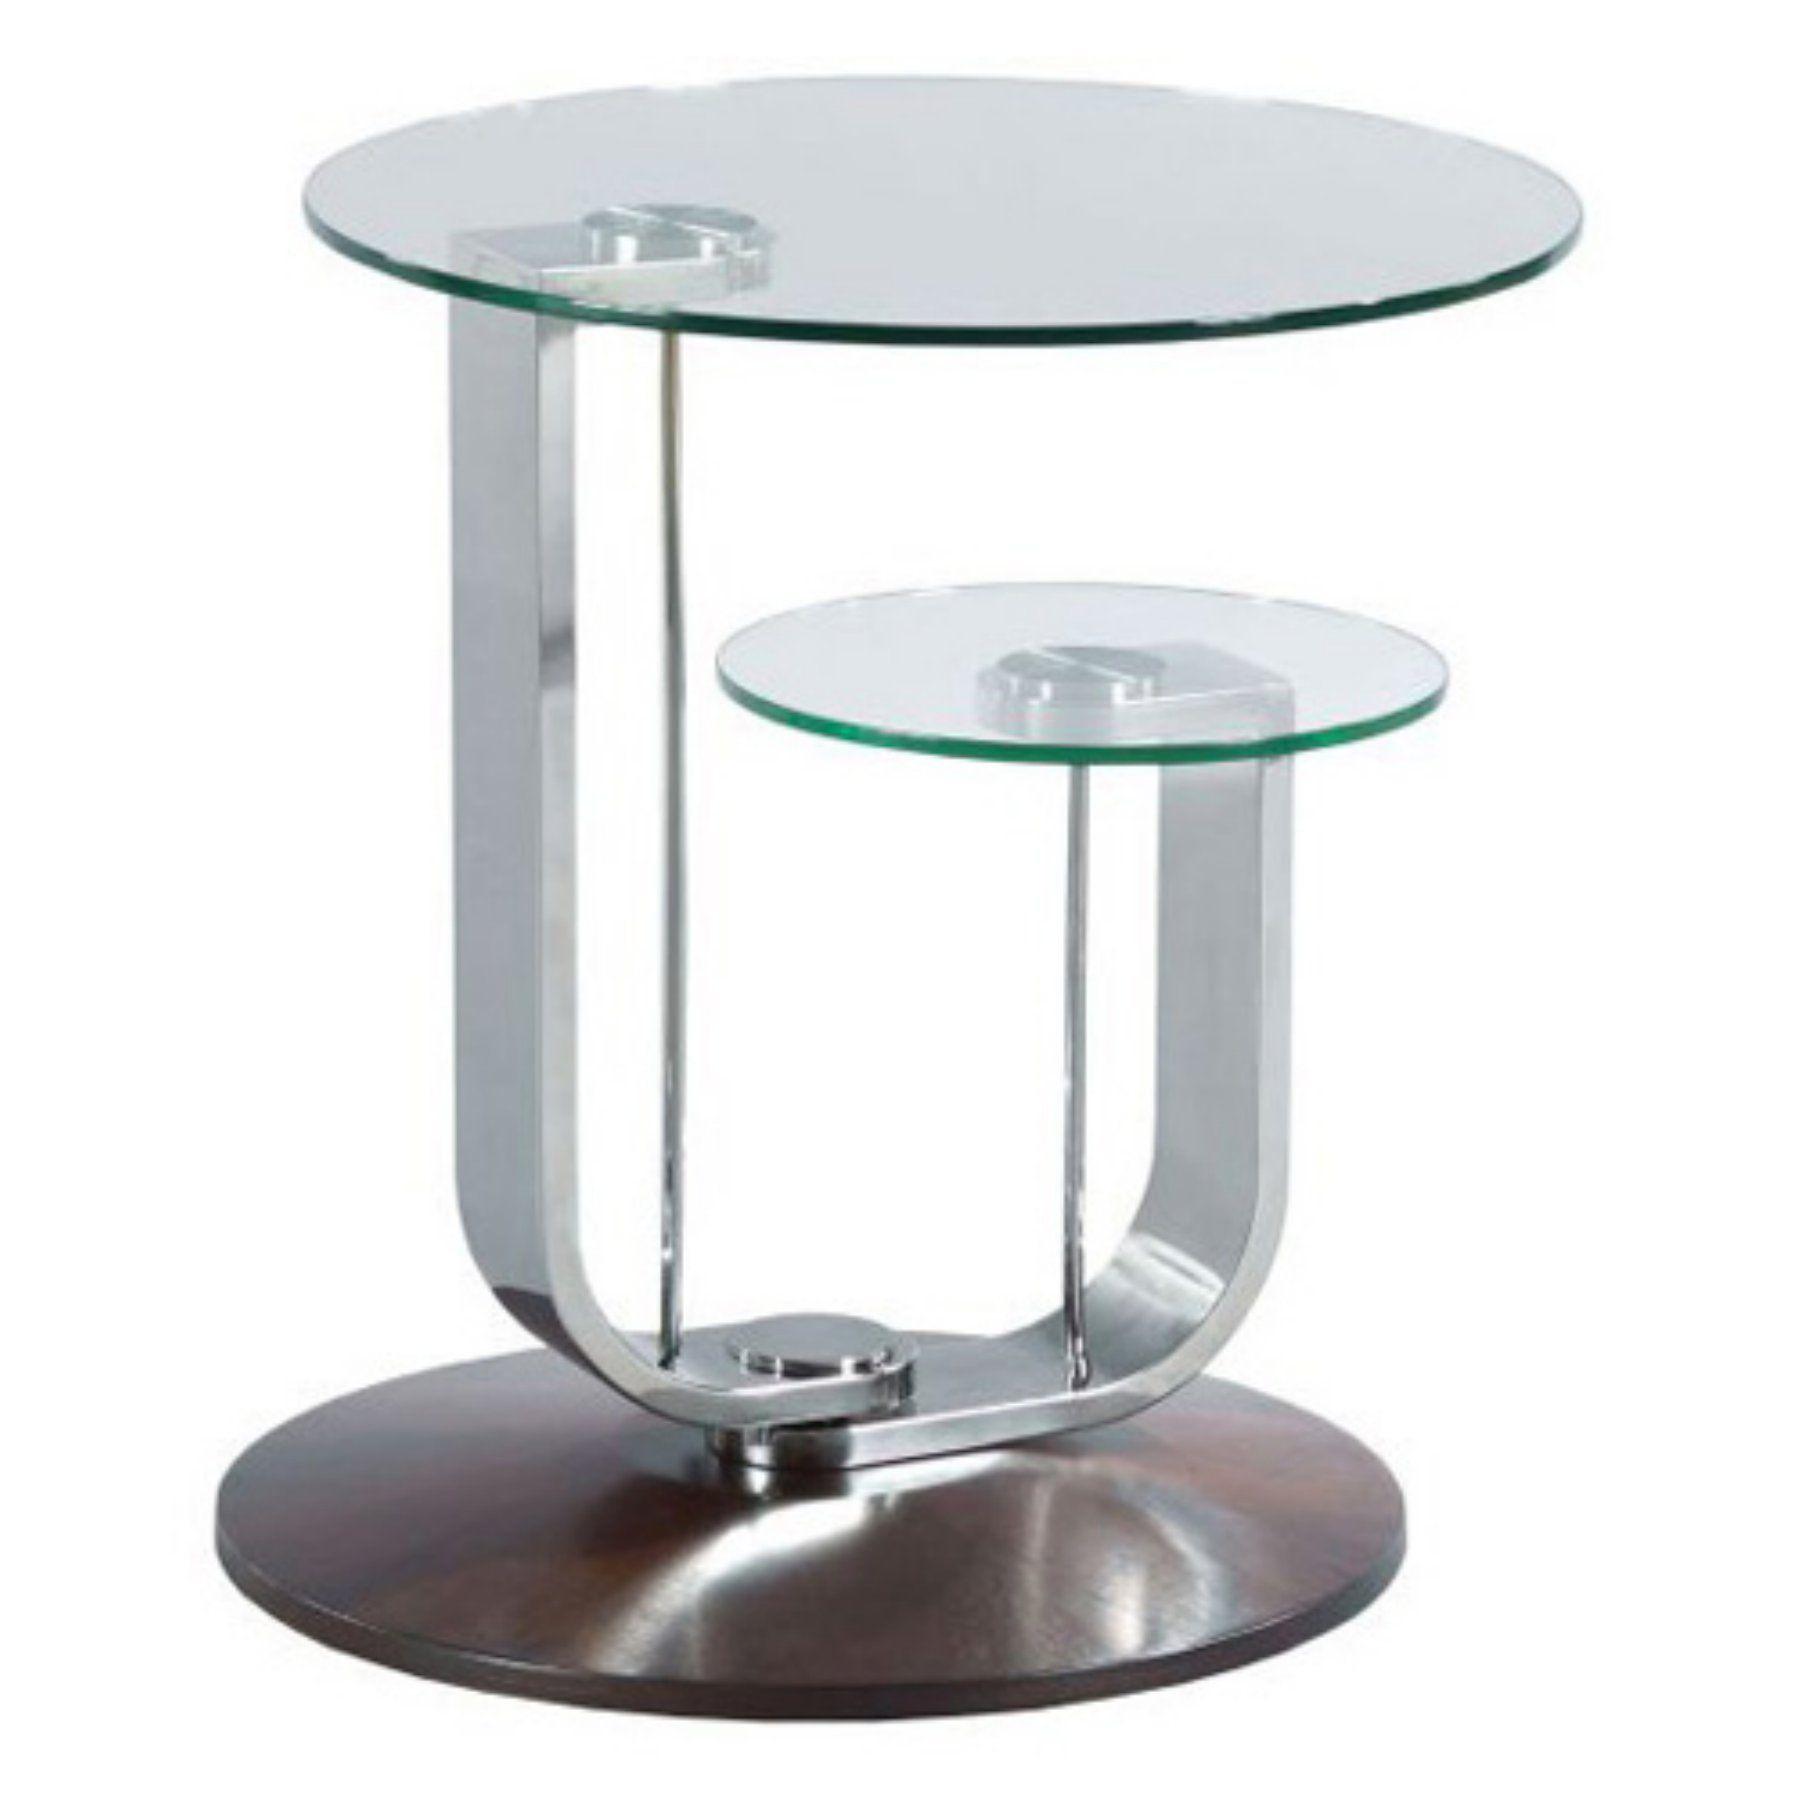 Hammary Pivot Round End Table 548 916 Hammary Furniture